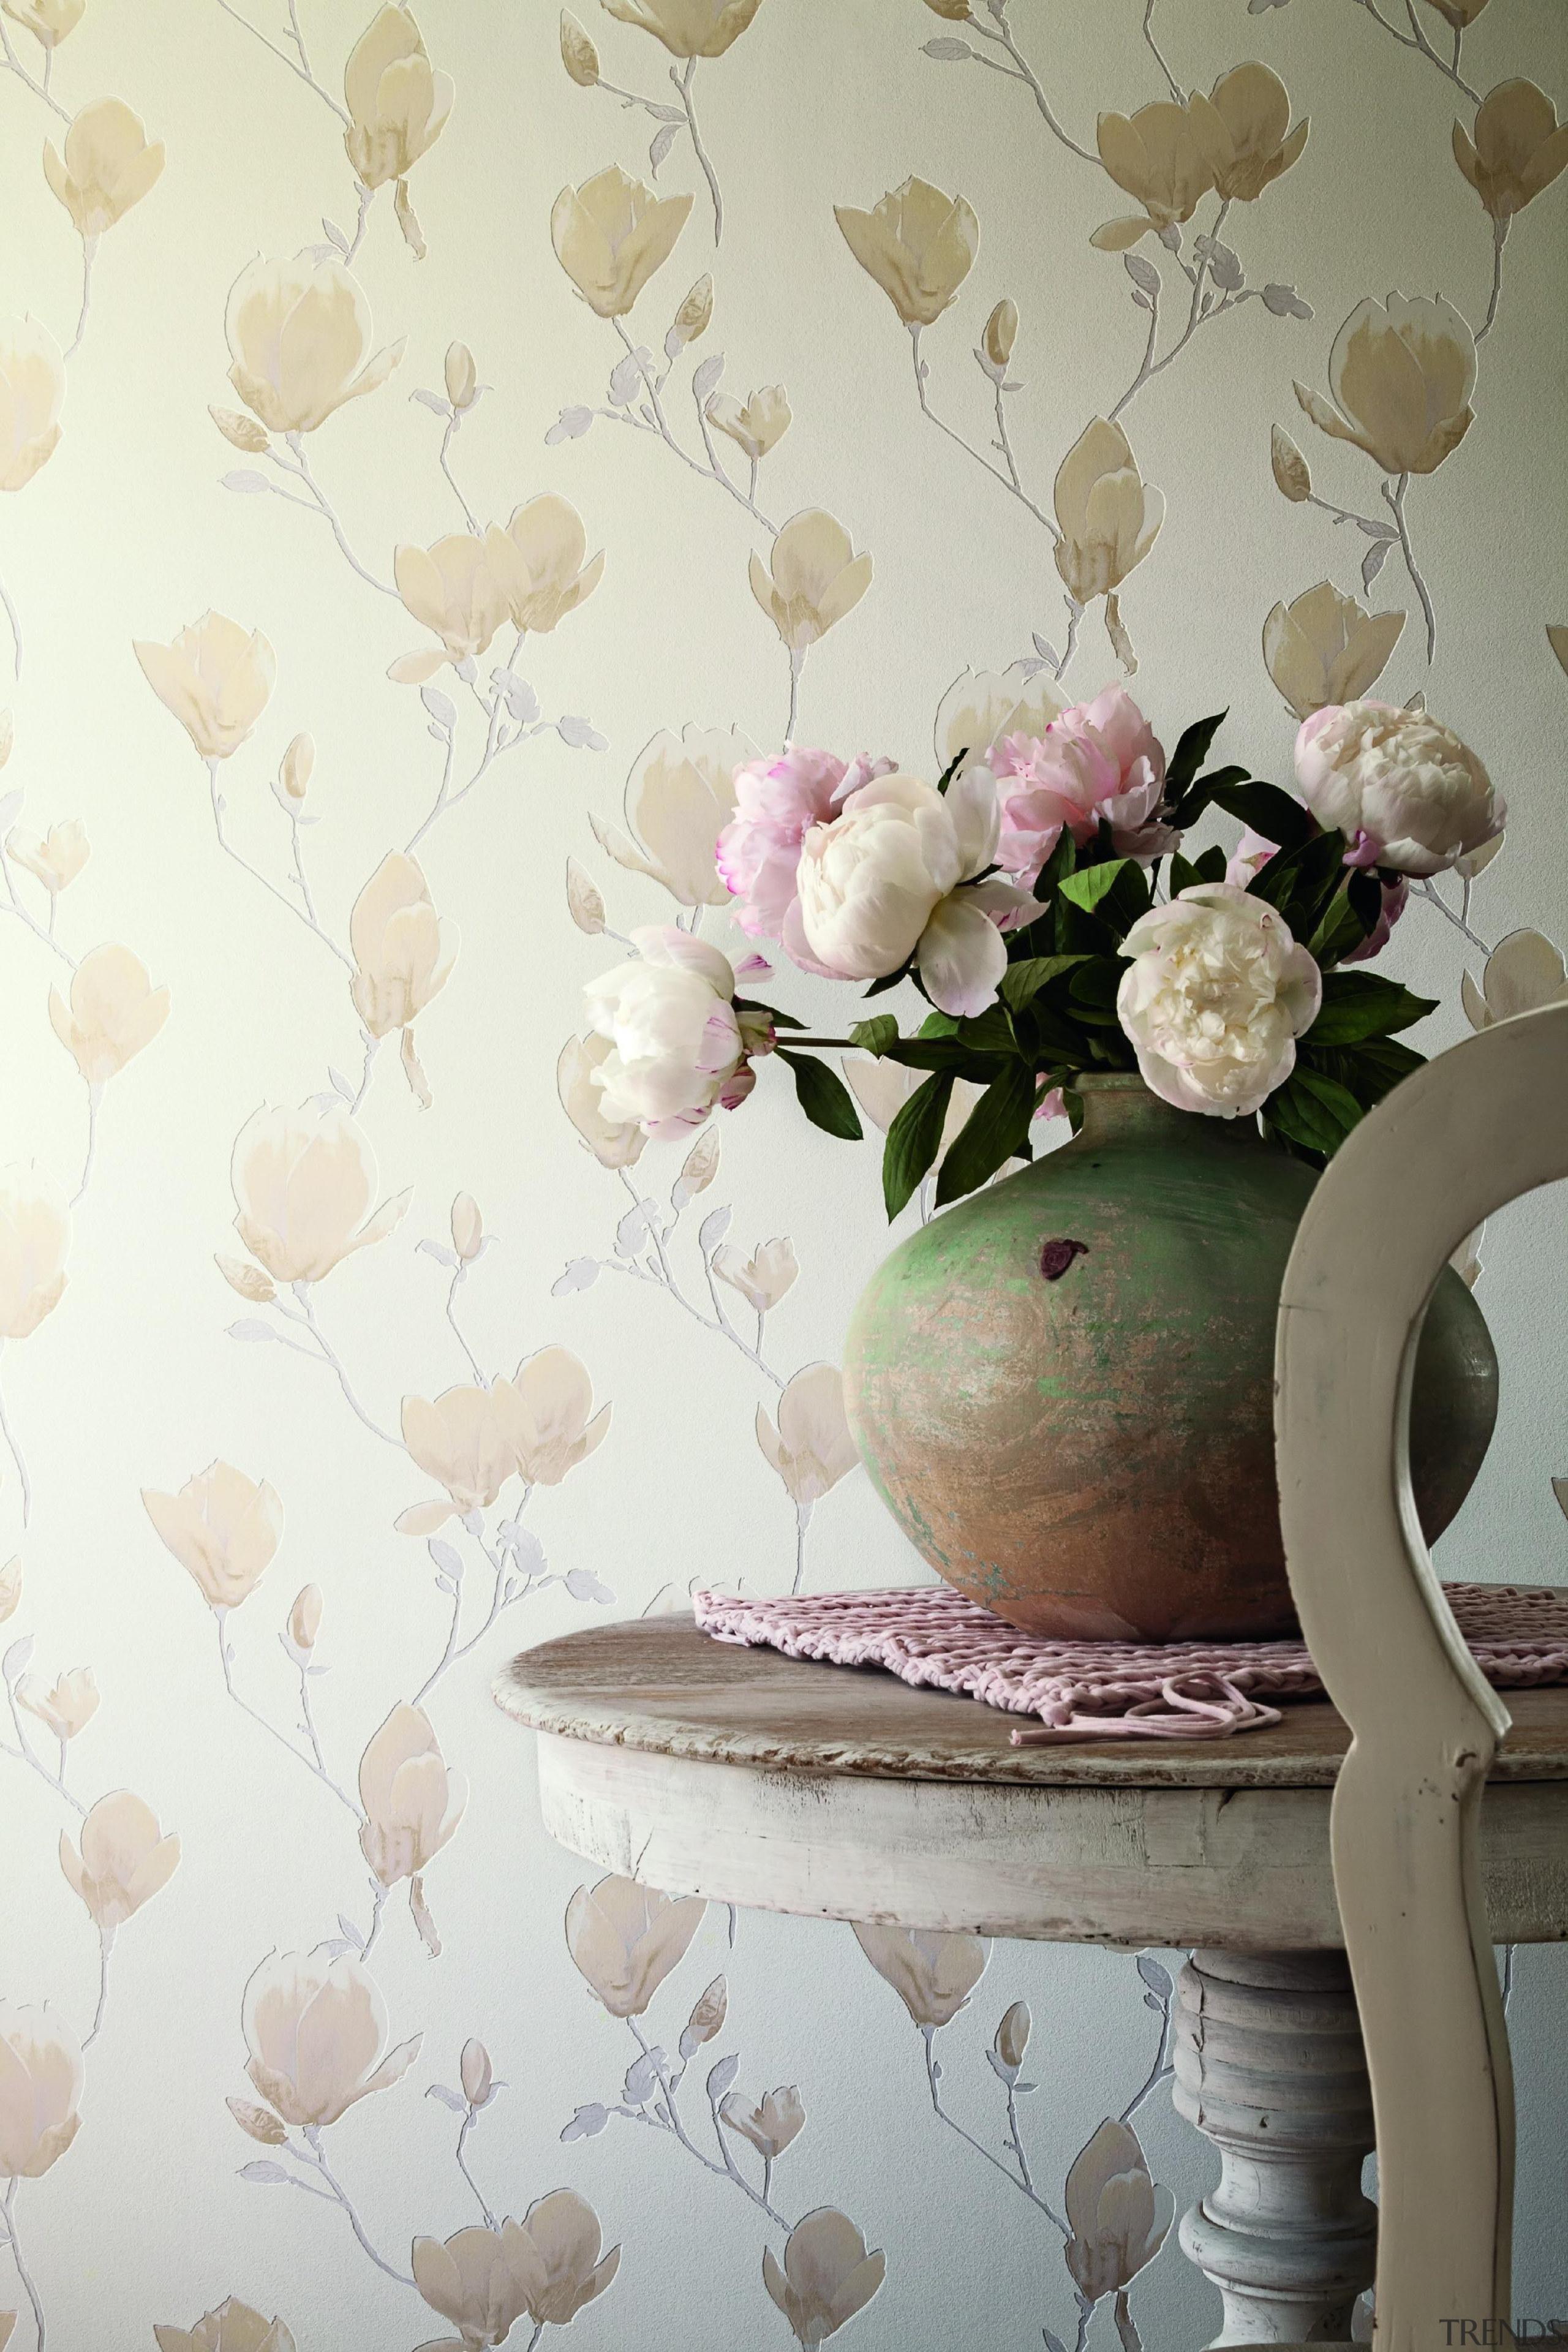 Camarque Range - Camarque Range - decor | decor, floristry, flower, interior design, petal, pink, wall, wallpaper, white, gray